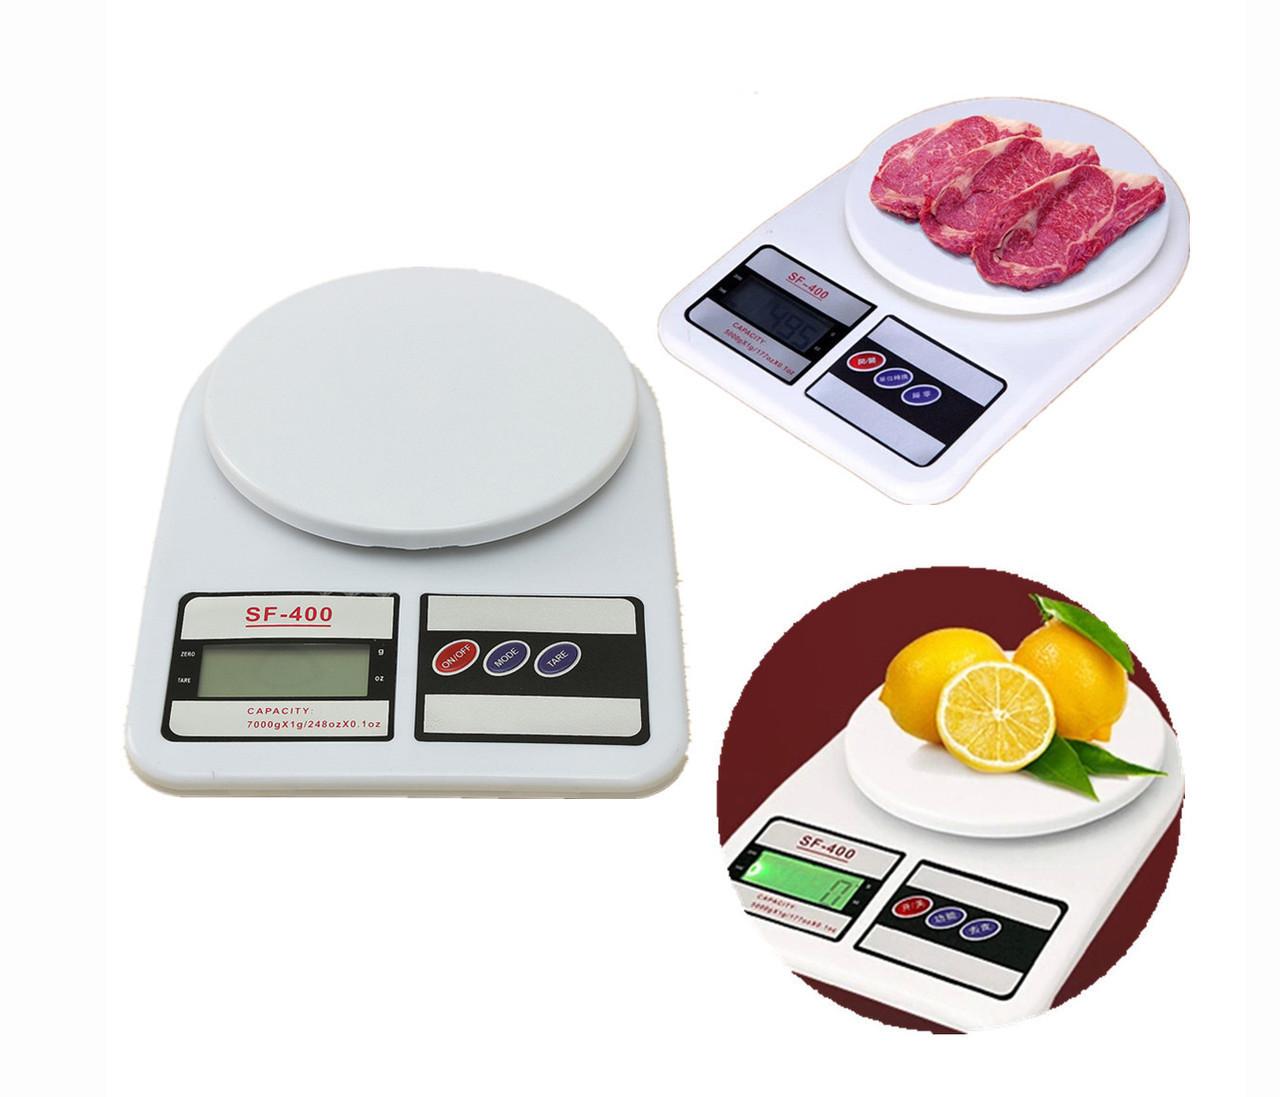 Кухонные весы до 10 кг с LCD дисплеем